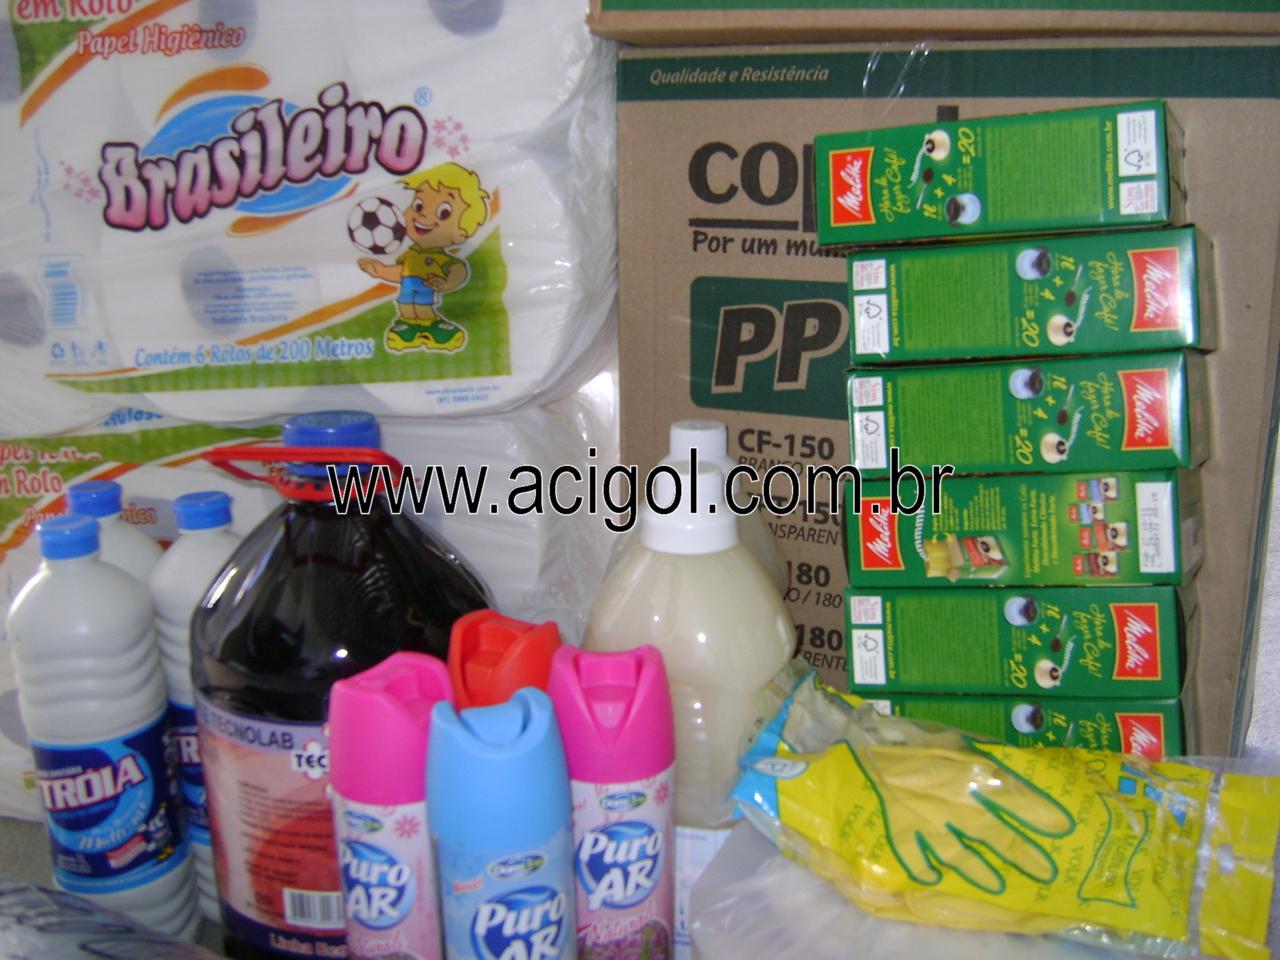 compra para consumo mensal-foto acigol 81 34451782-DSC09757